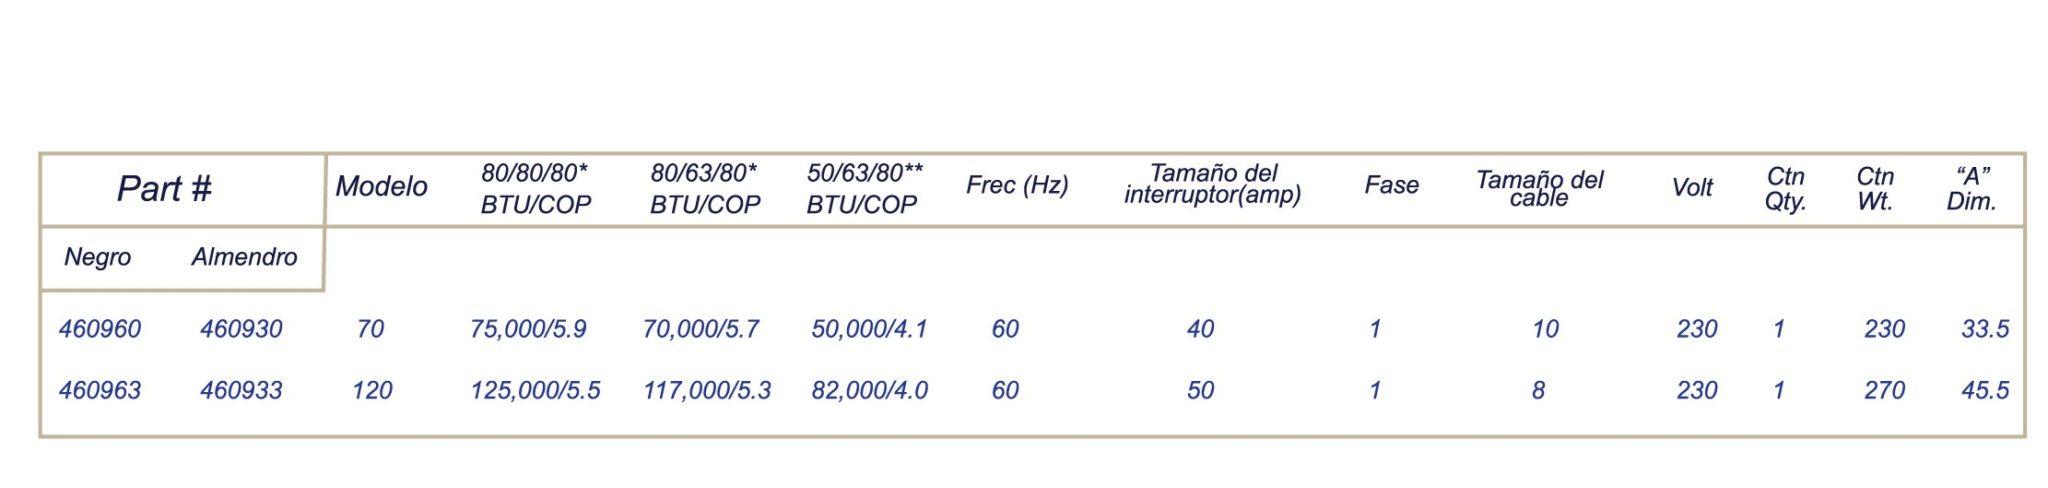 Detalle Bomba de calor de alto desempeño ULTRATEMP™